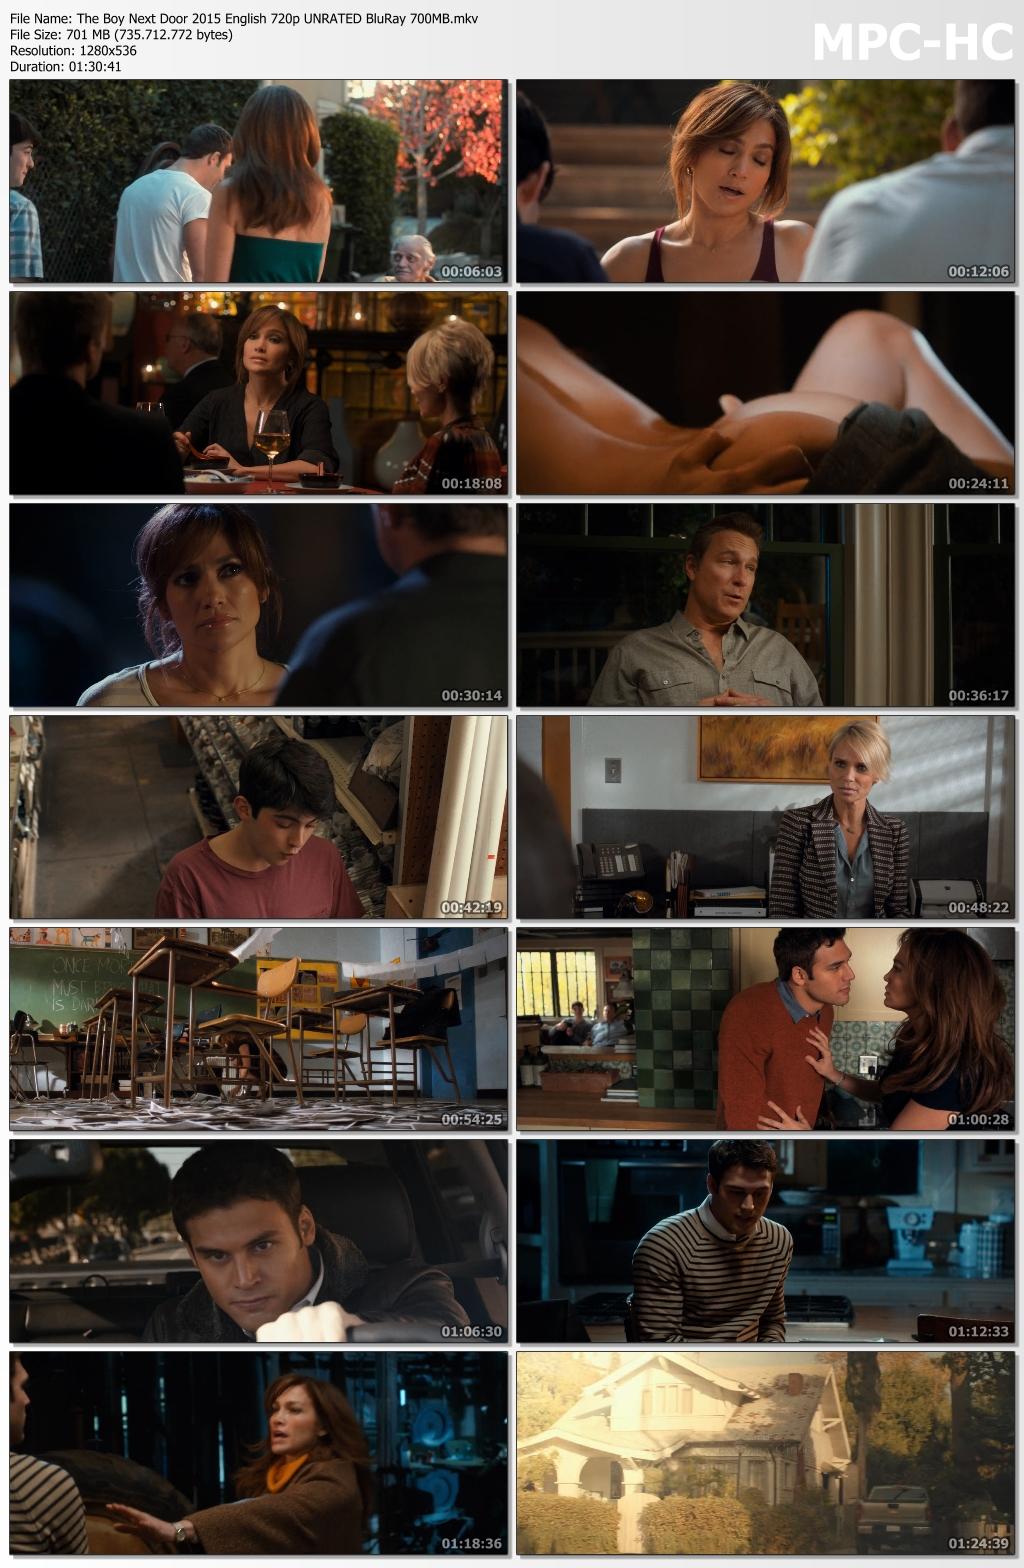 The-Boy-Next-Door-2015-English-720p-UNRATED-Blu-Ray-700-MB-mkv-thumbs